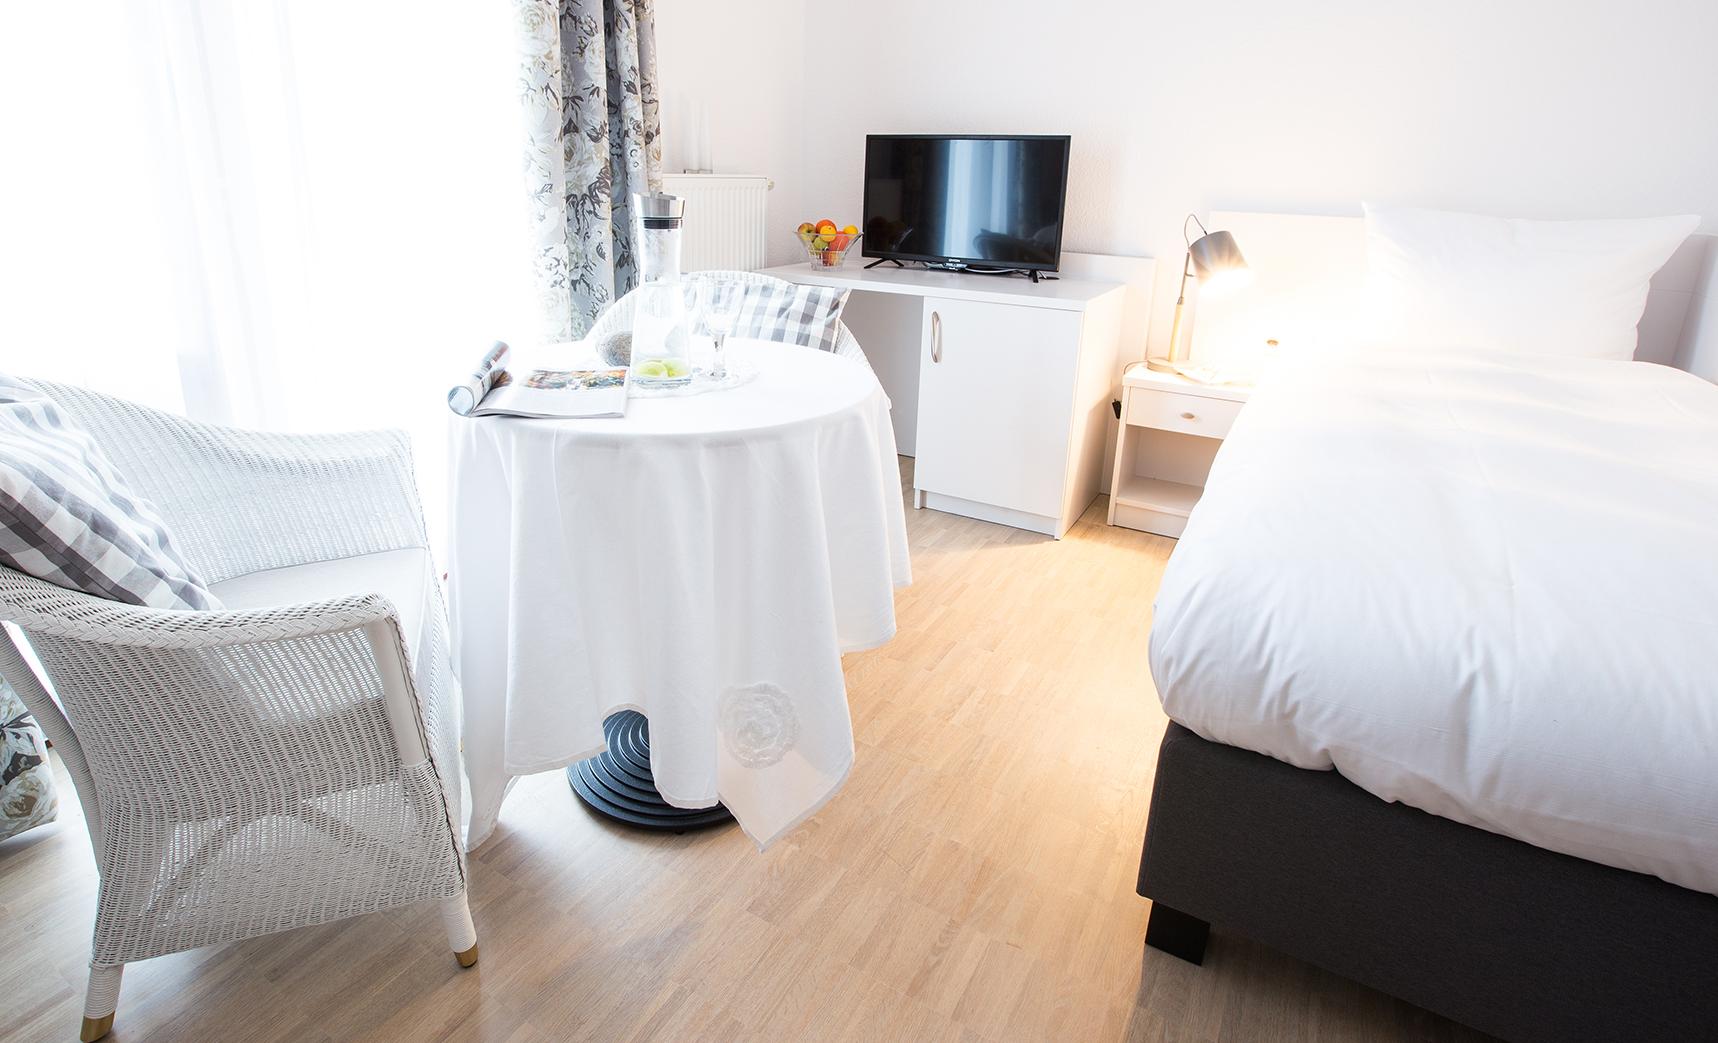 zimmer verdunkeln best zimmer verdunkeln ohne rolladen. Black Bedroom Furniture Sets. Home Design Ideas